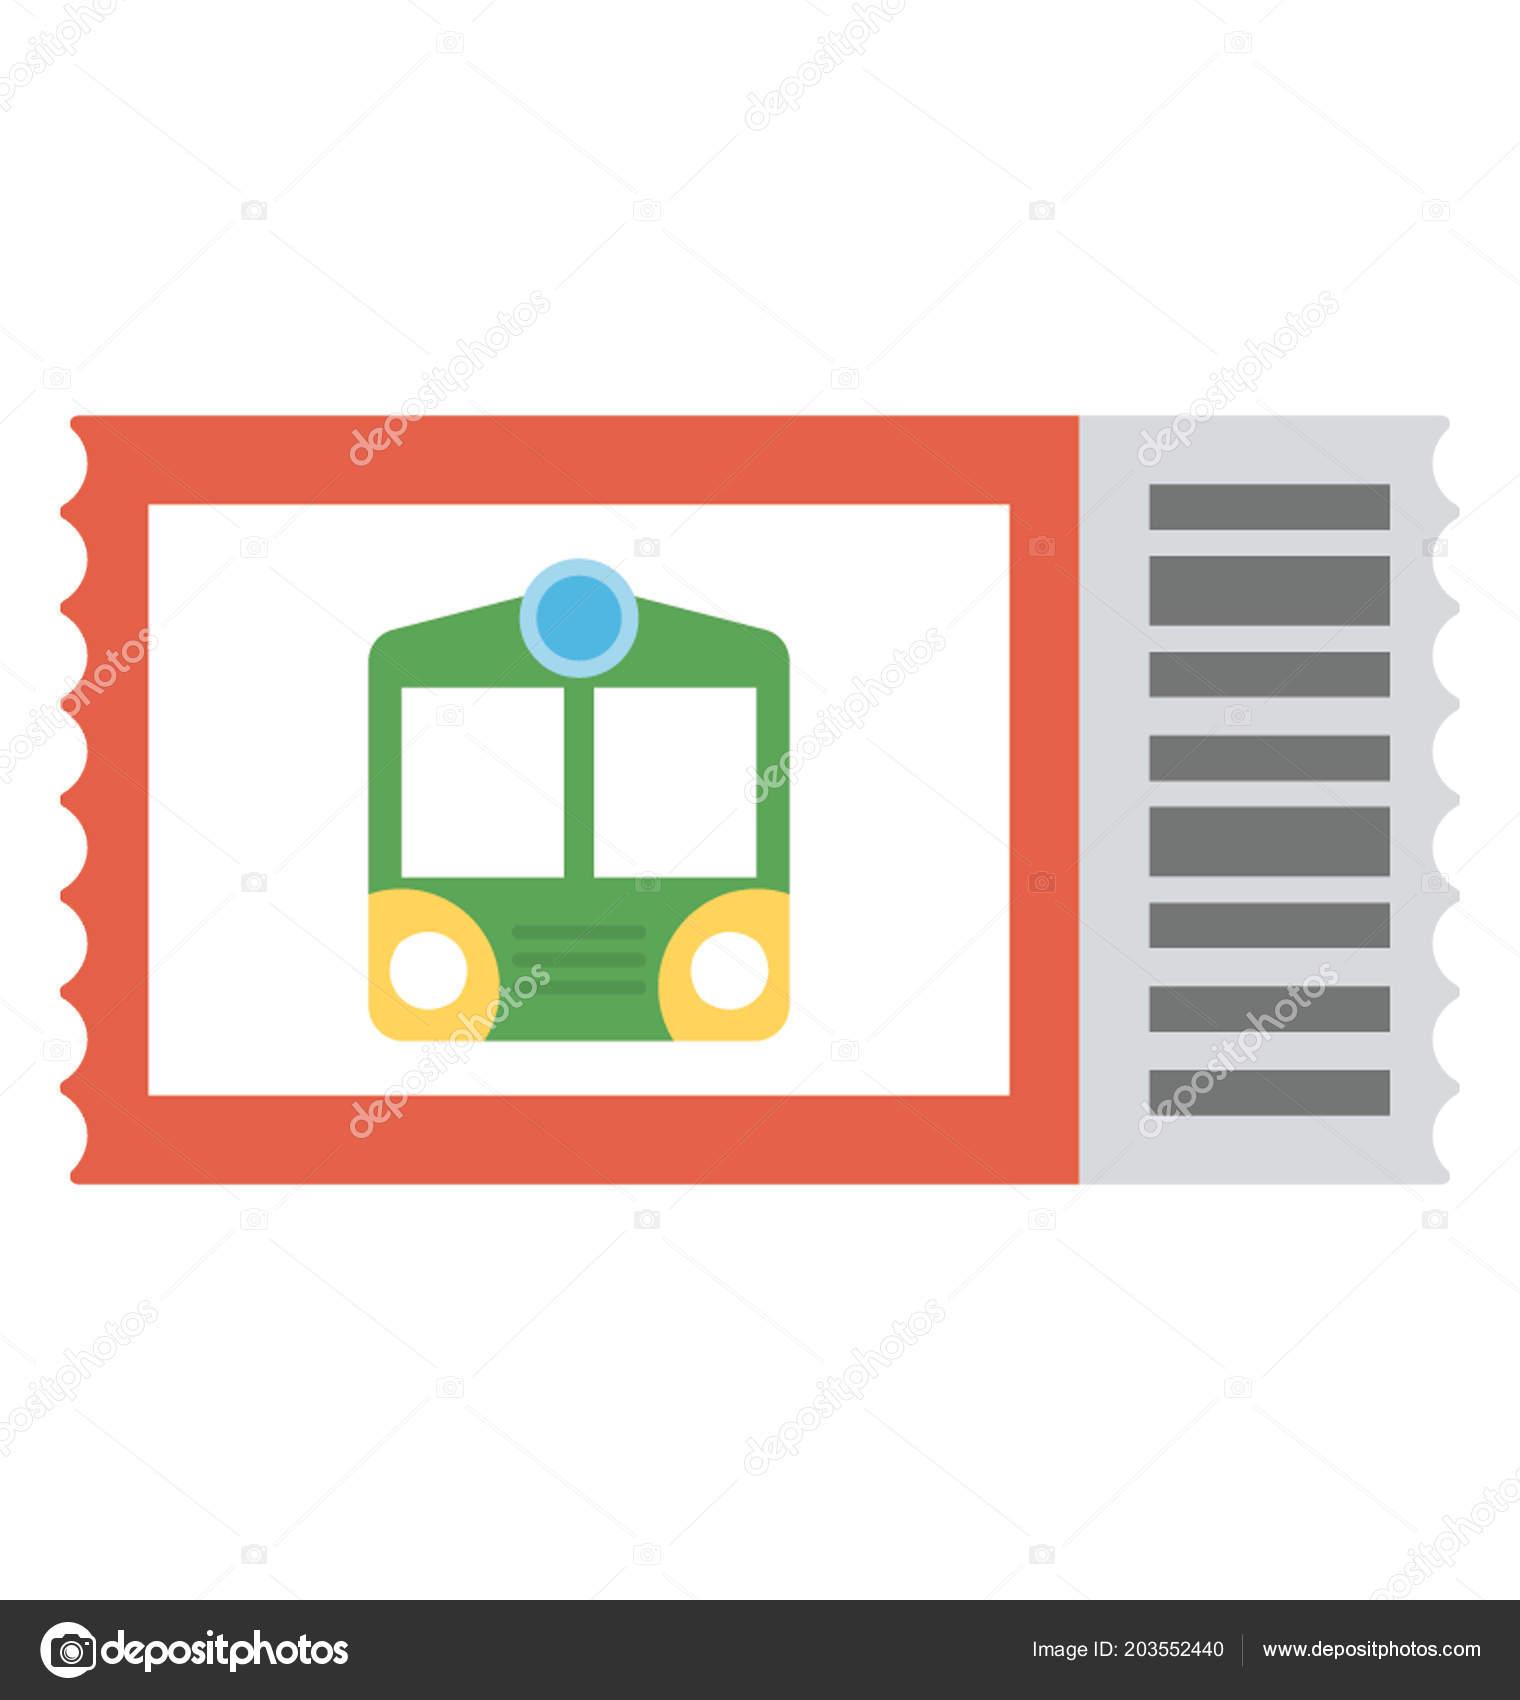 Journeys start better with Trainline